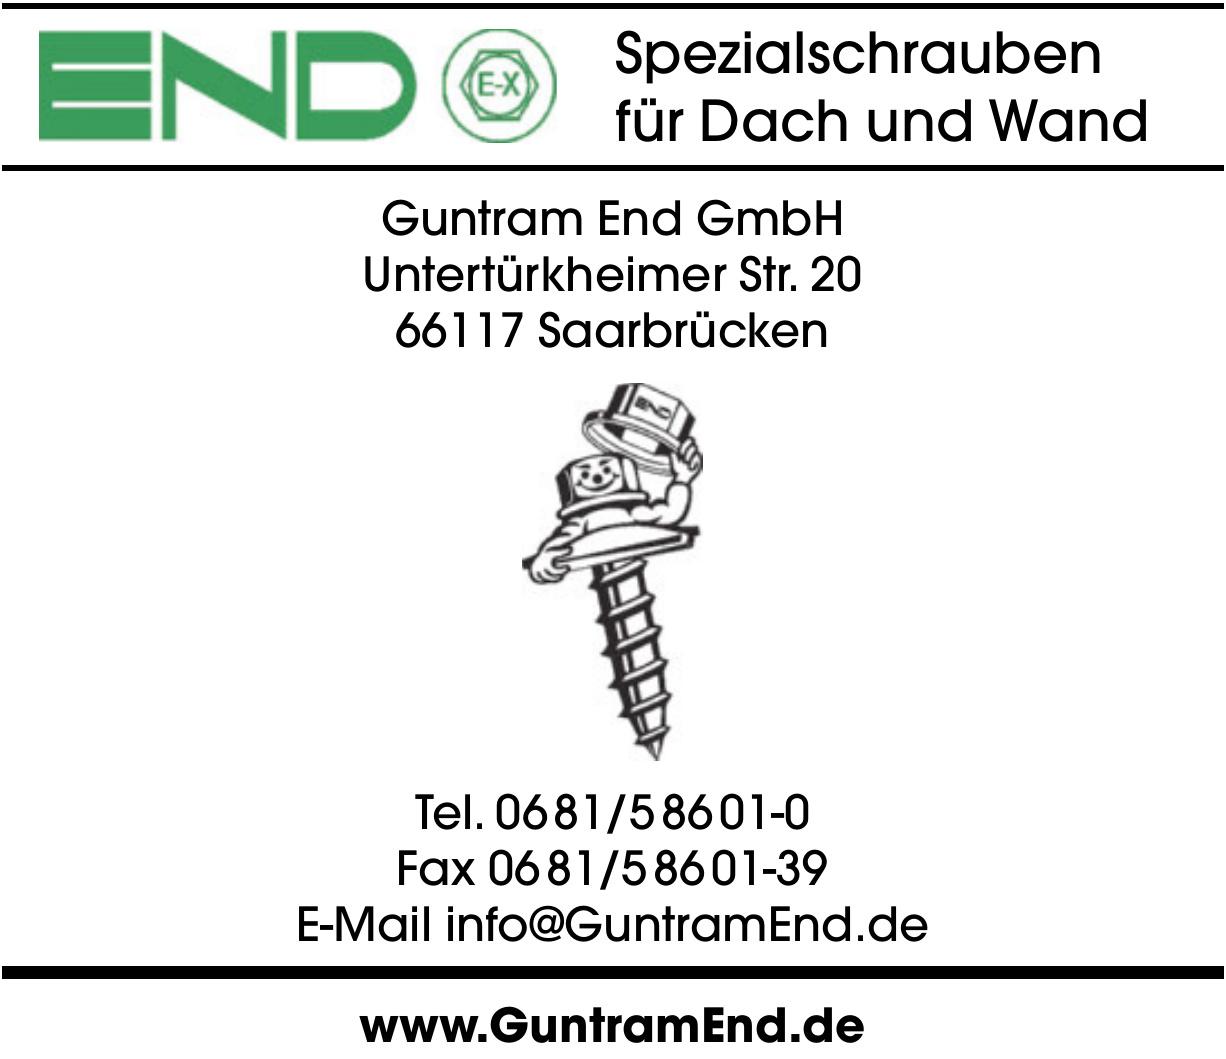 Guntram End GmbH